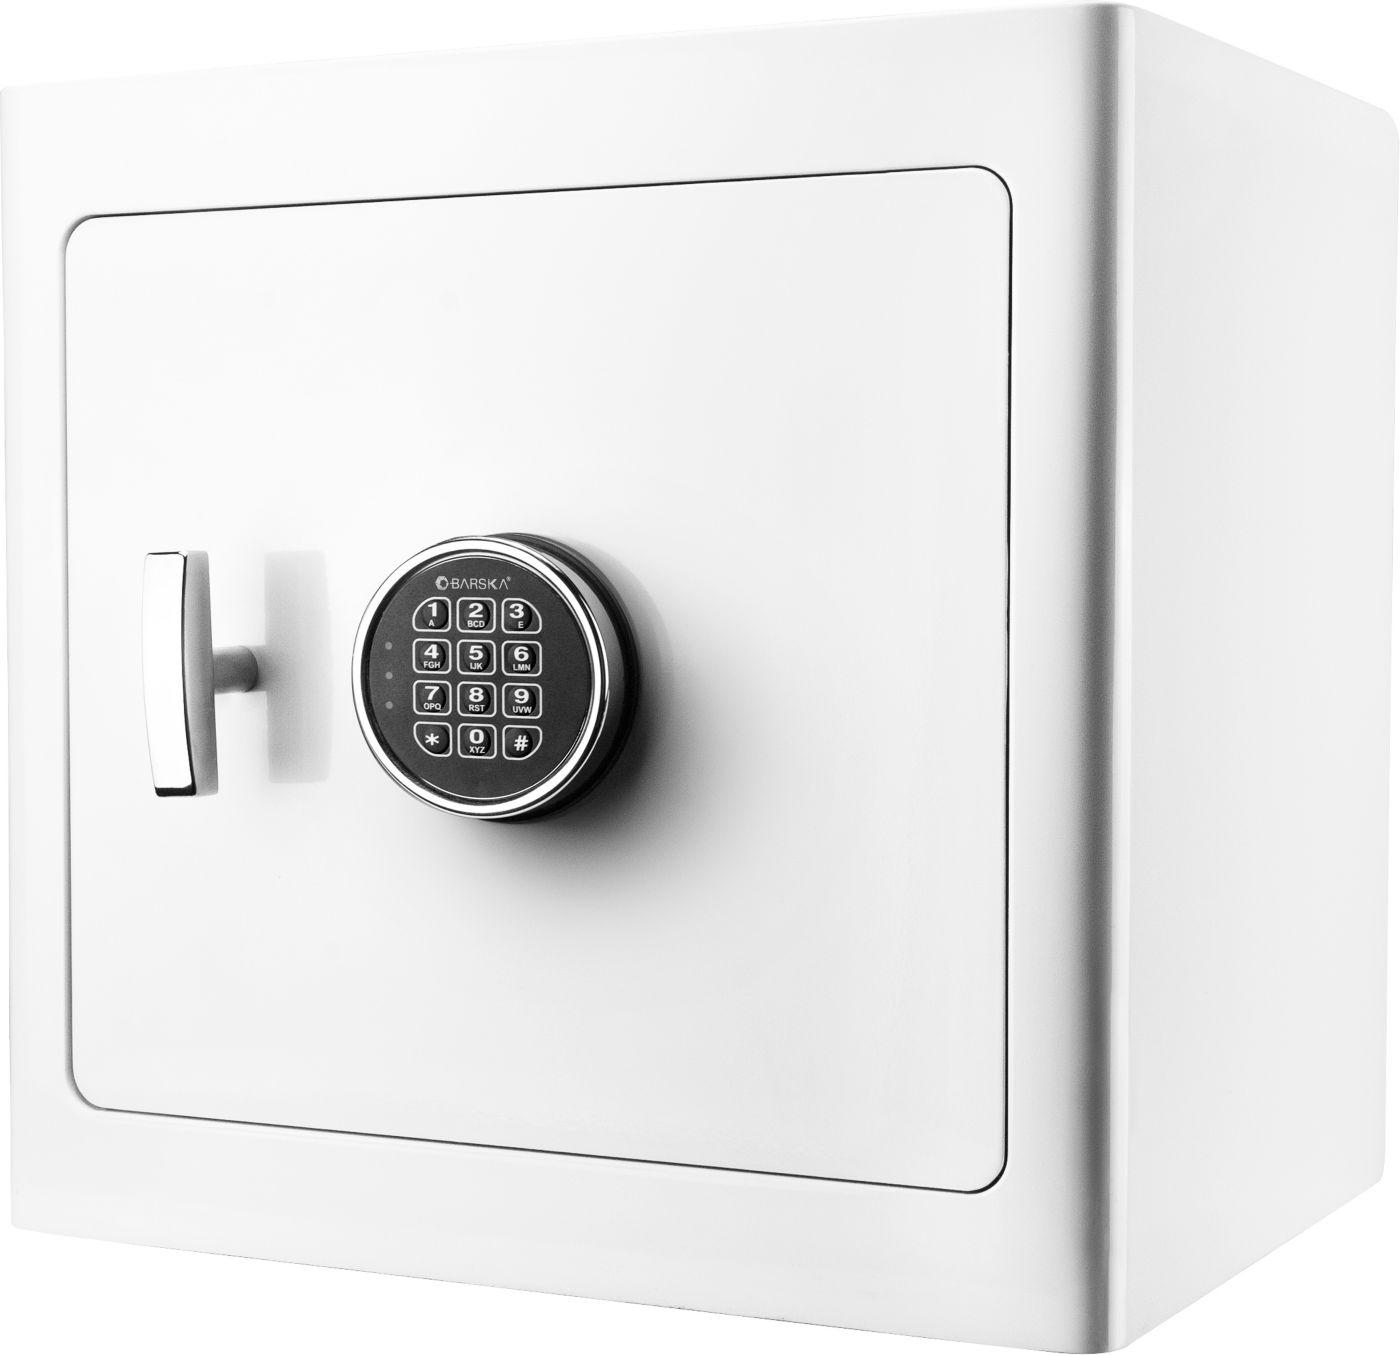 Barska Fireproof Jewelry Safe with Keypad Lock